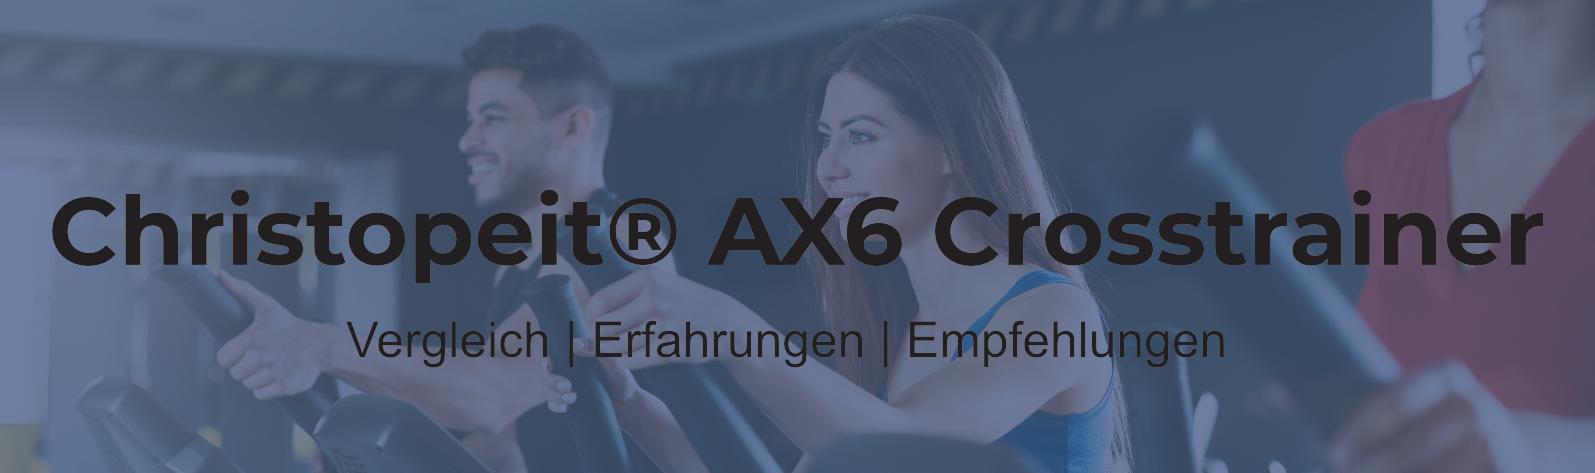 Christopeit AX6® Crosstrainer